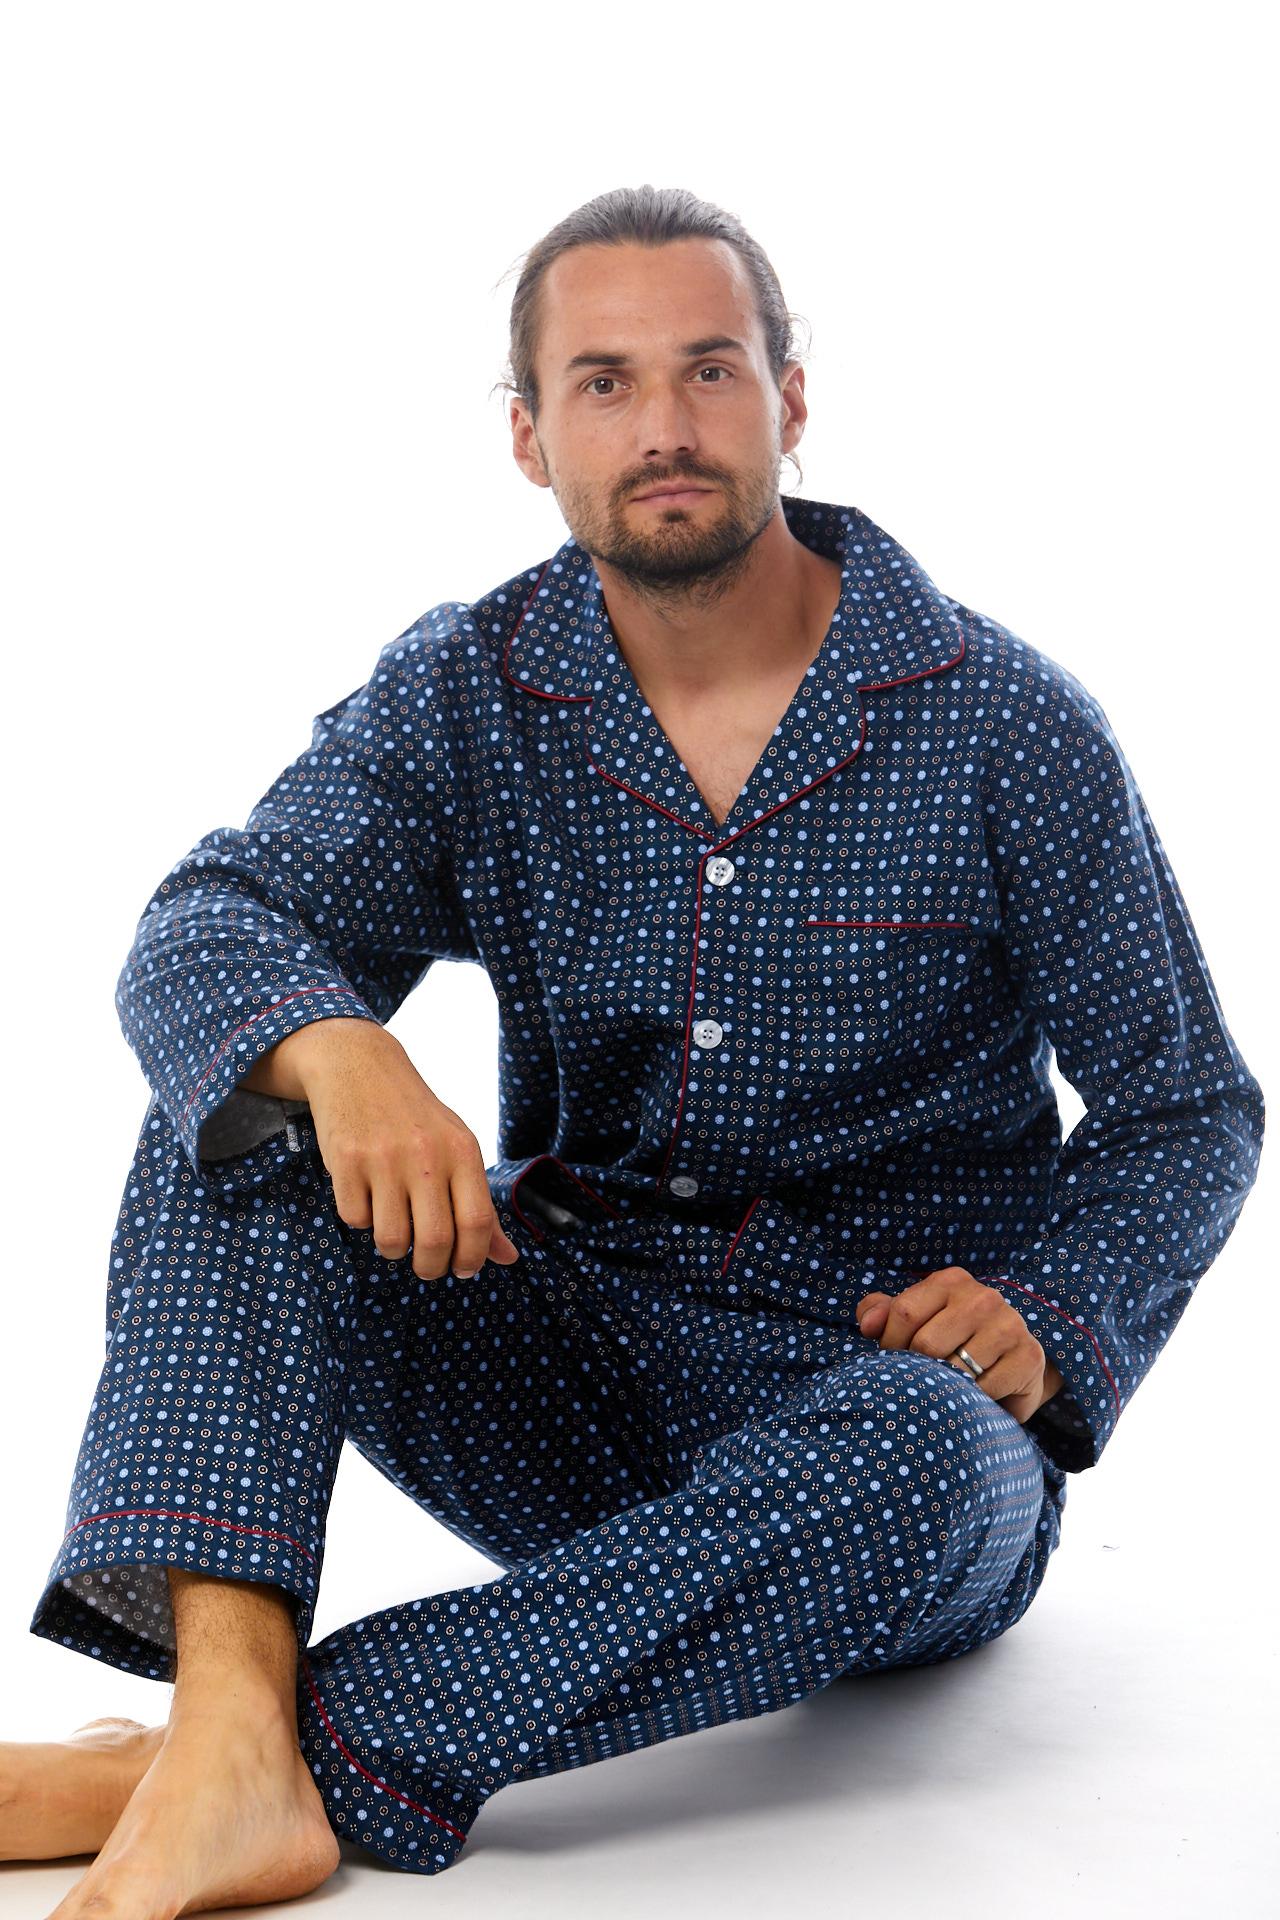 Pyžamo pro muže, flanel 1P0440